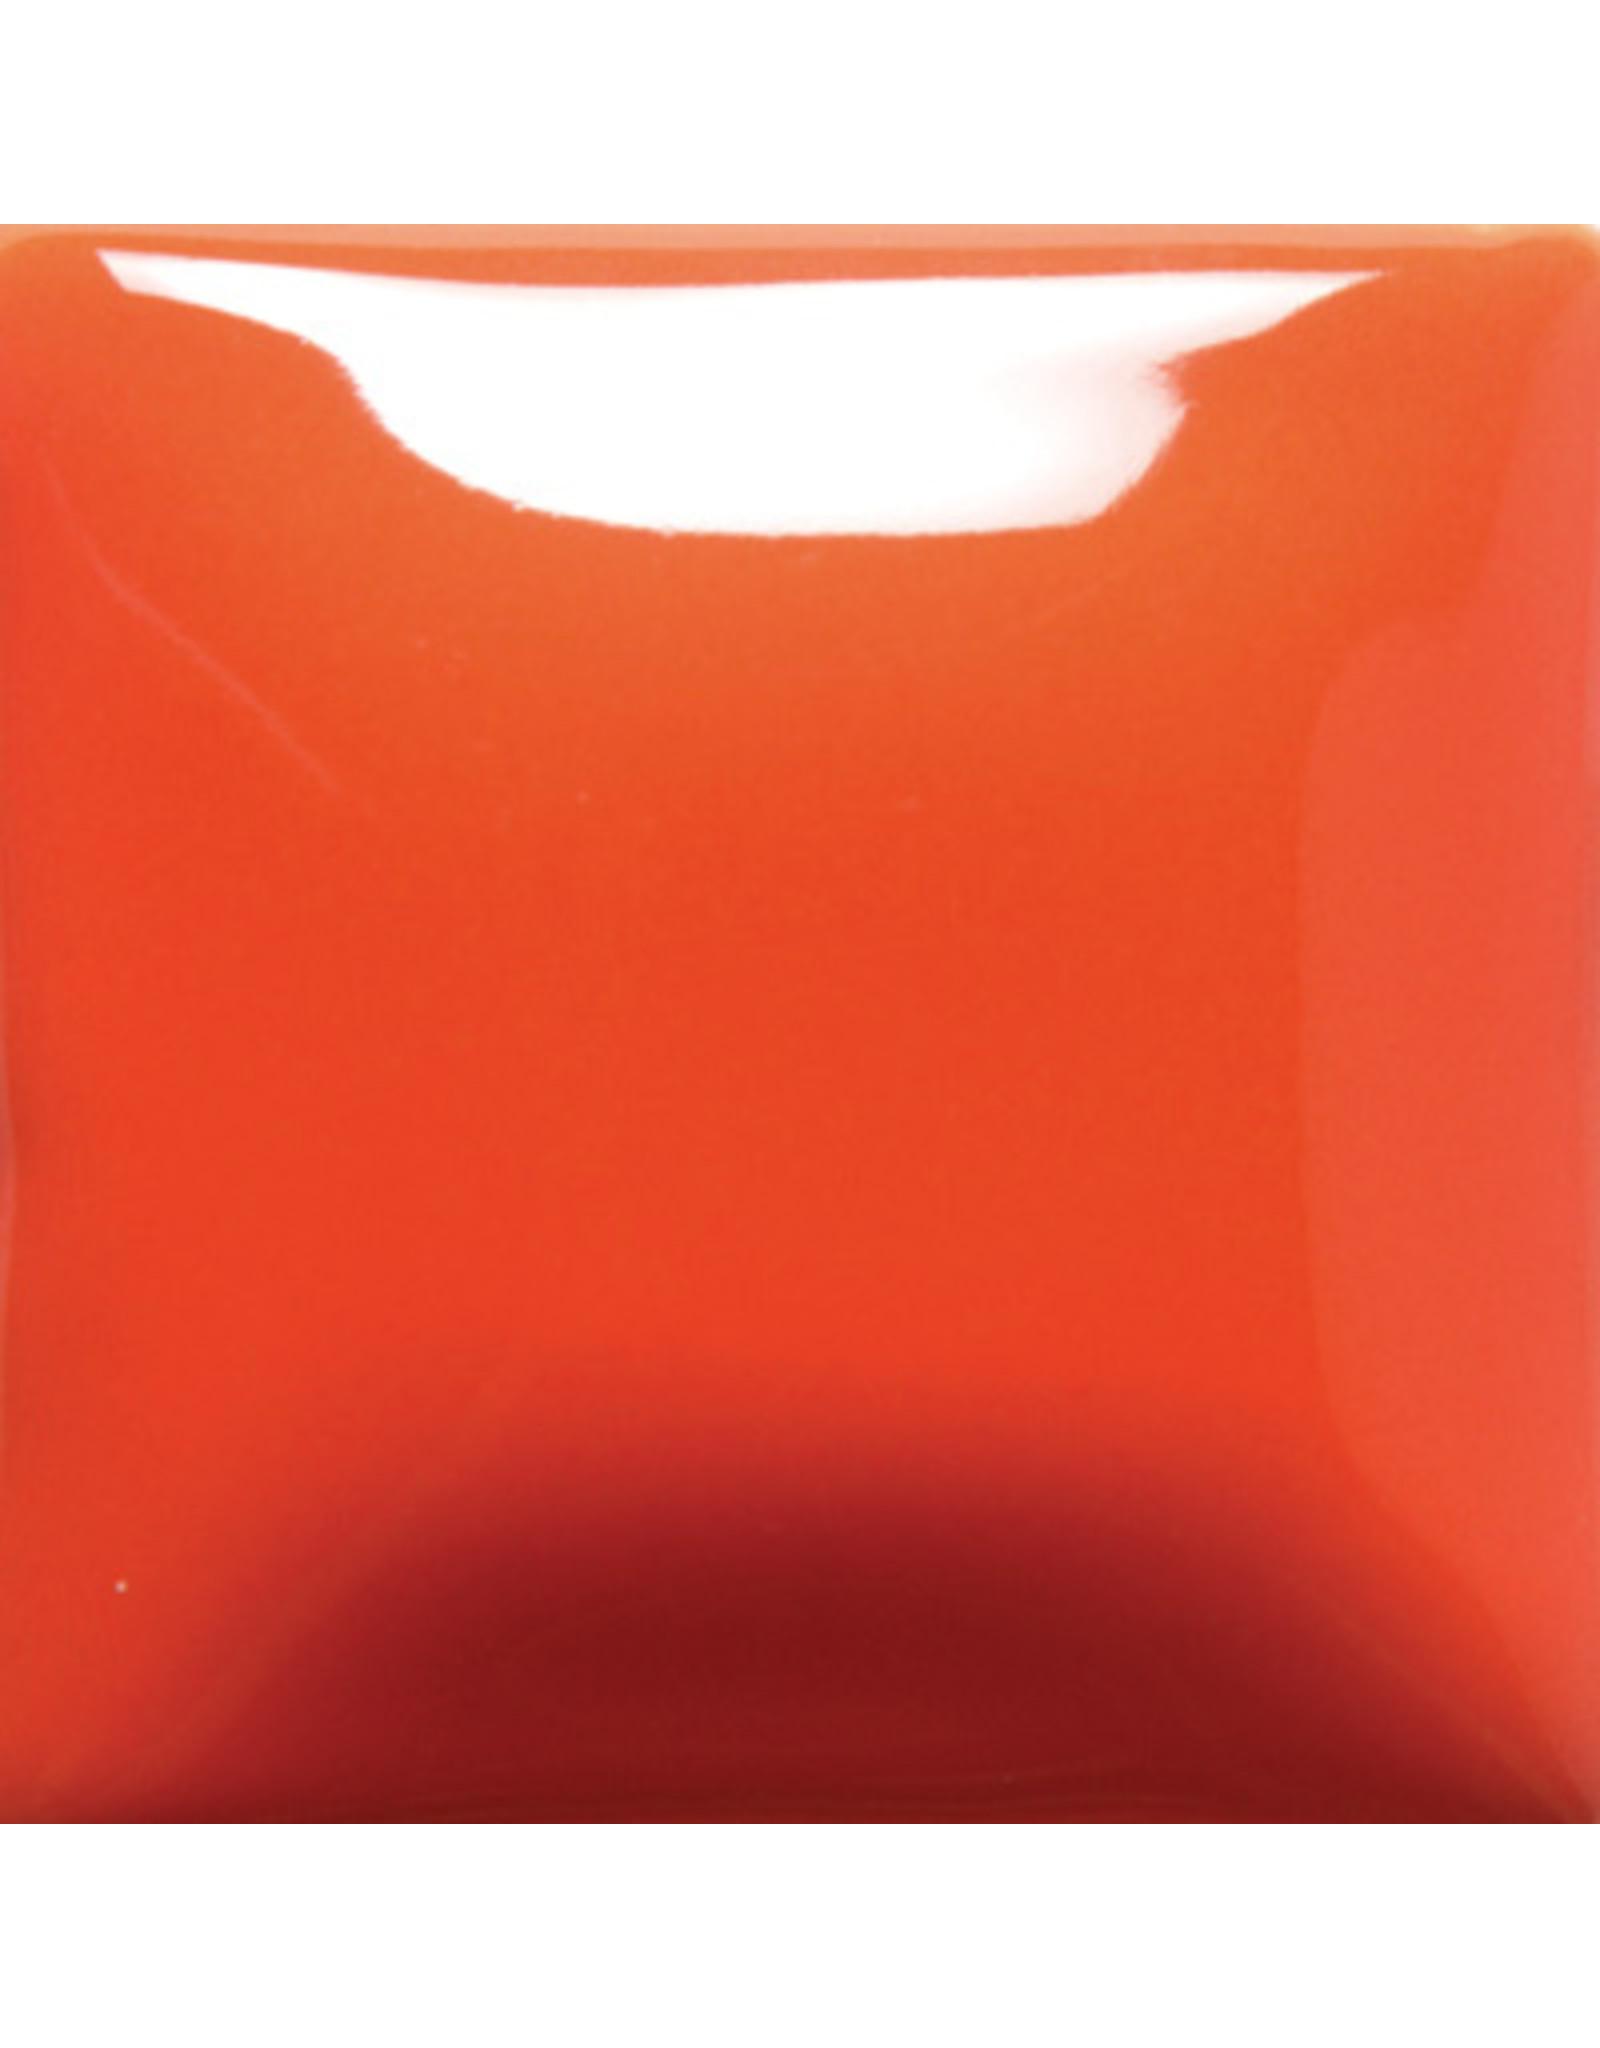 Mayco Mayco Foundations Orange 118ml